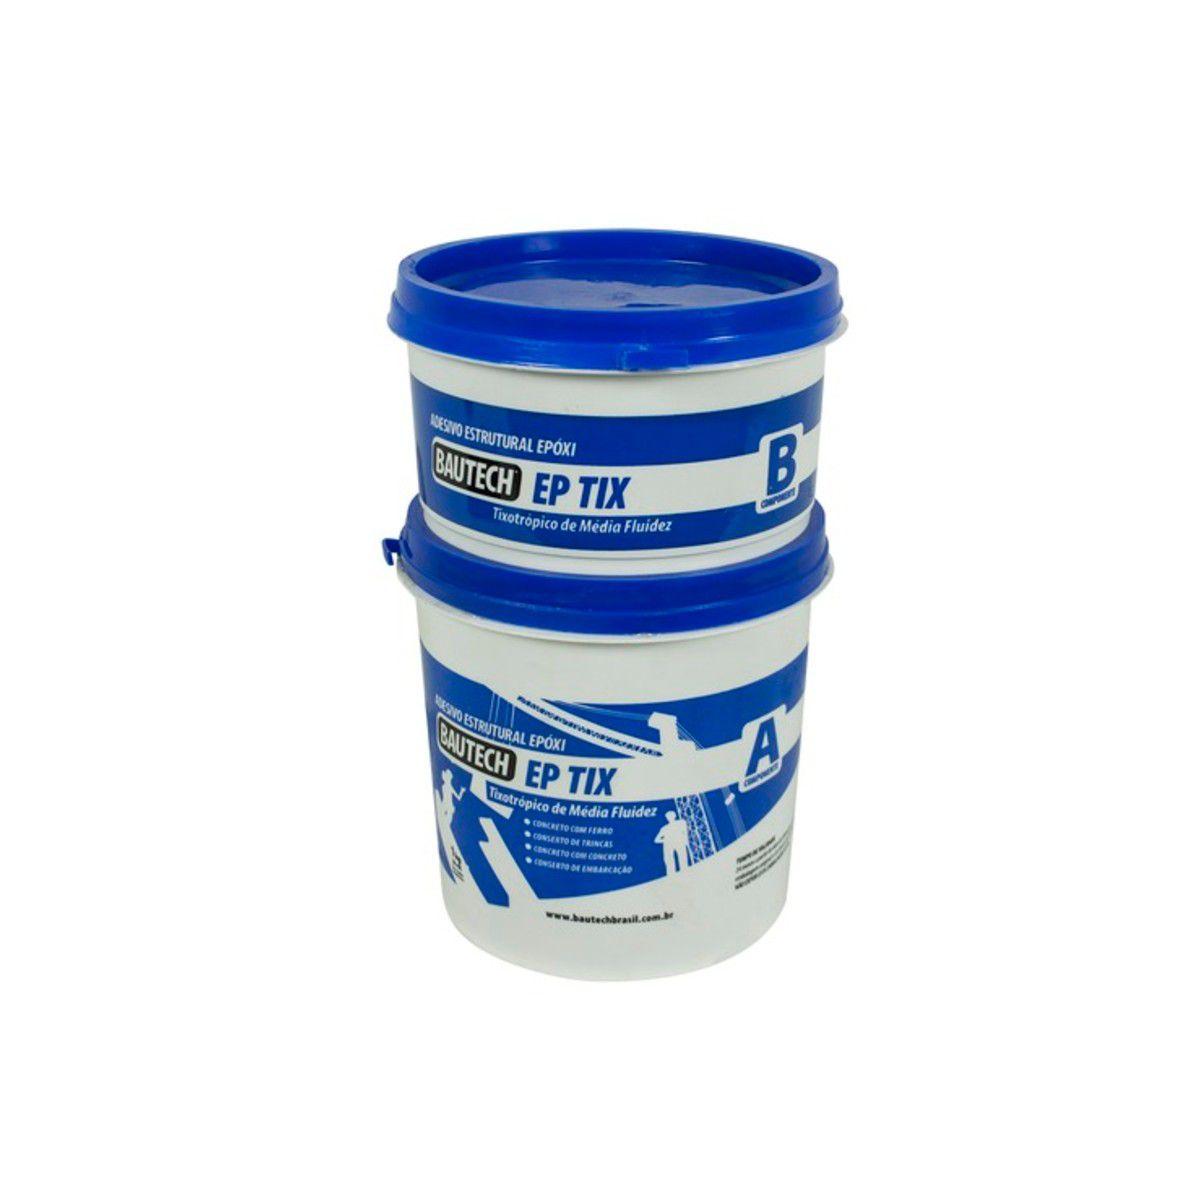 Cola Estrutural Adesivo Ep 1kg Compound Bautech